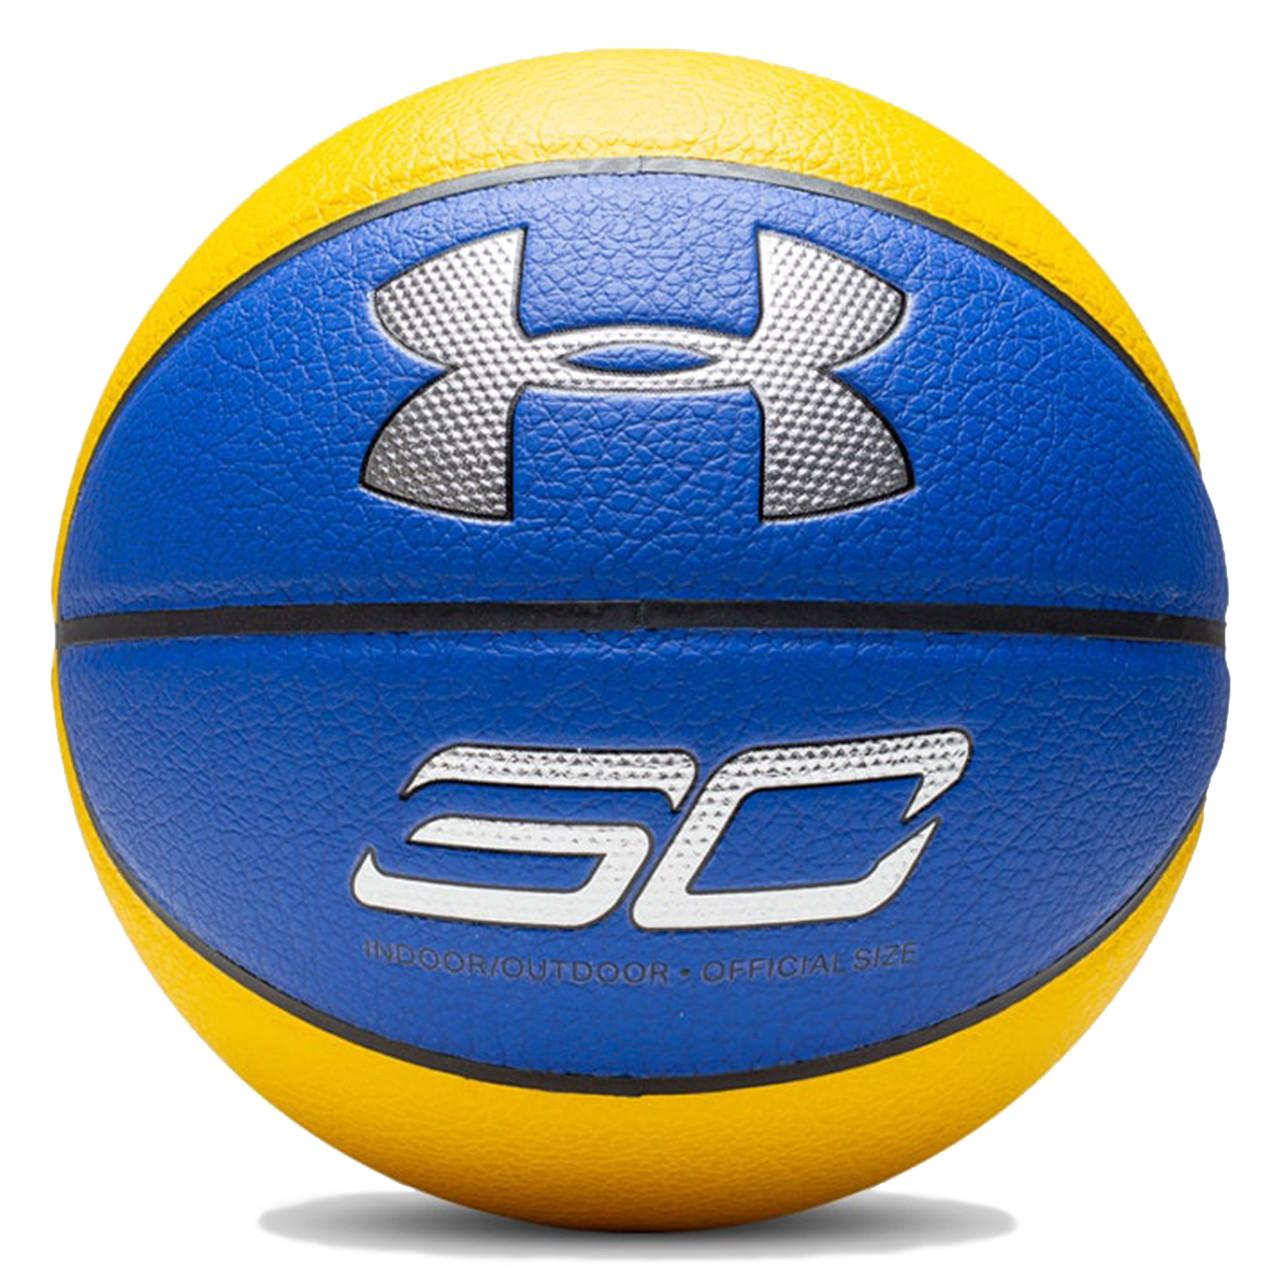 М'яч баскетбольний Under Armour Curry Composite 1328459-400